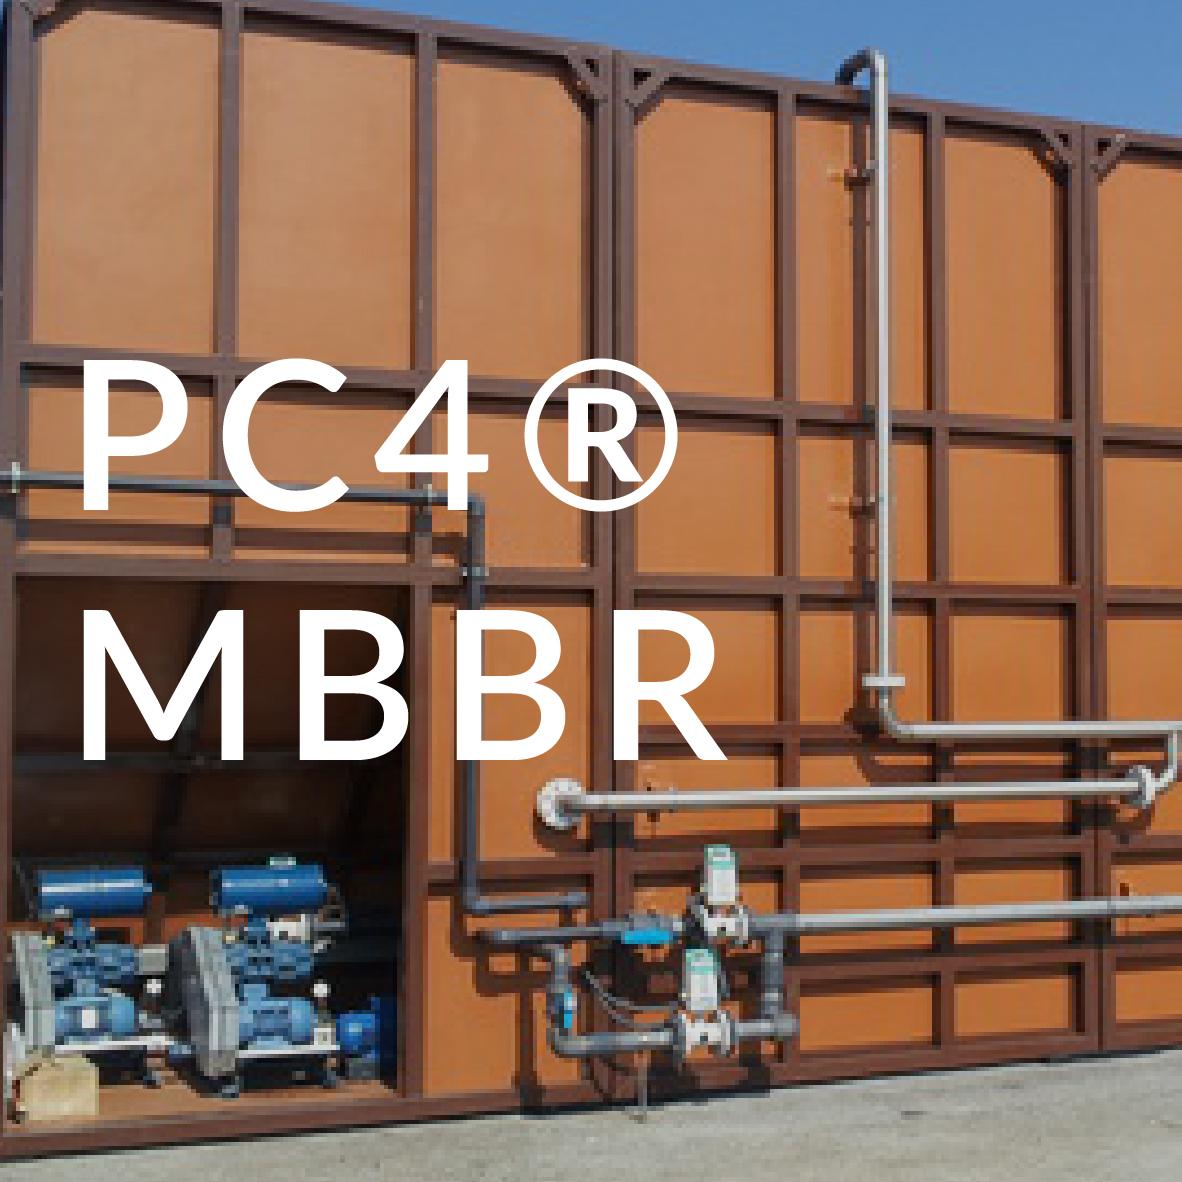 tecnologia PC4 MBBR Arema